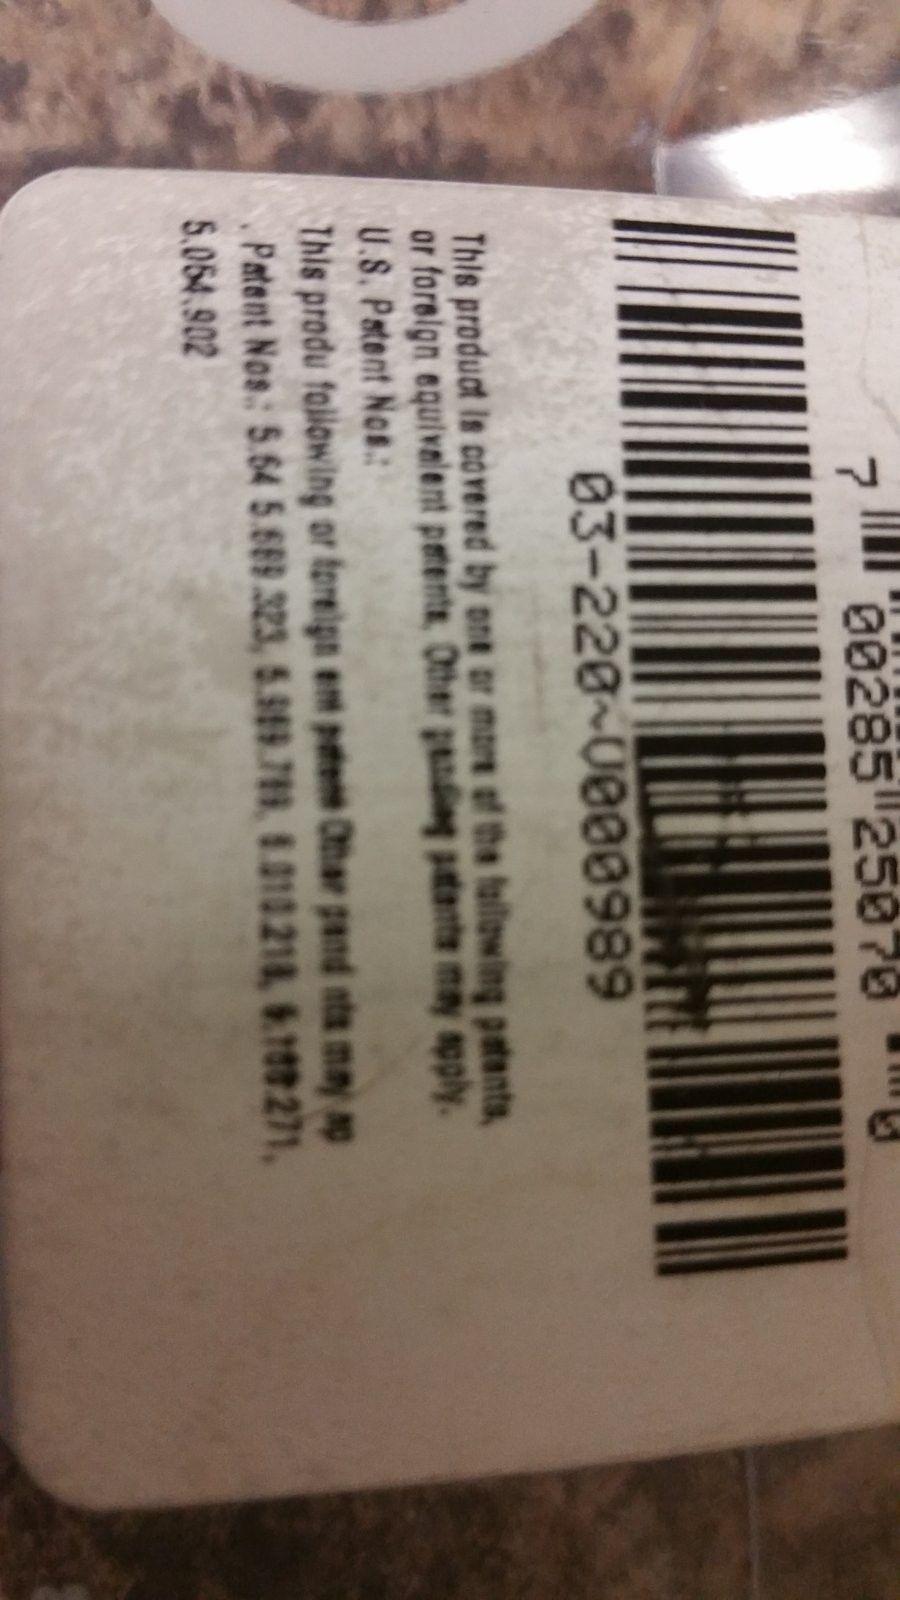 Matte Grey frames - too big for lenses? - 1472261724426-1716785725.jpg